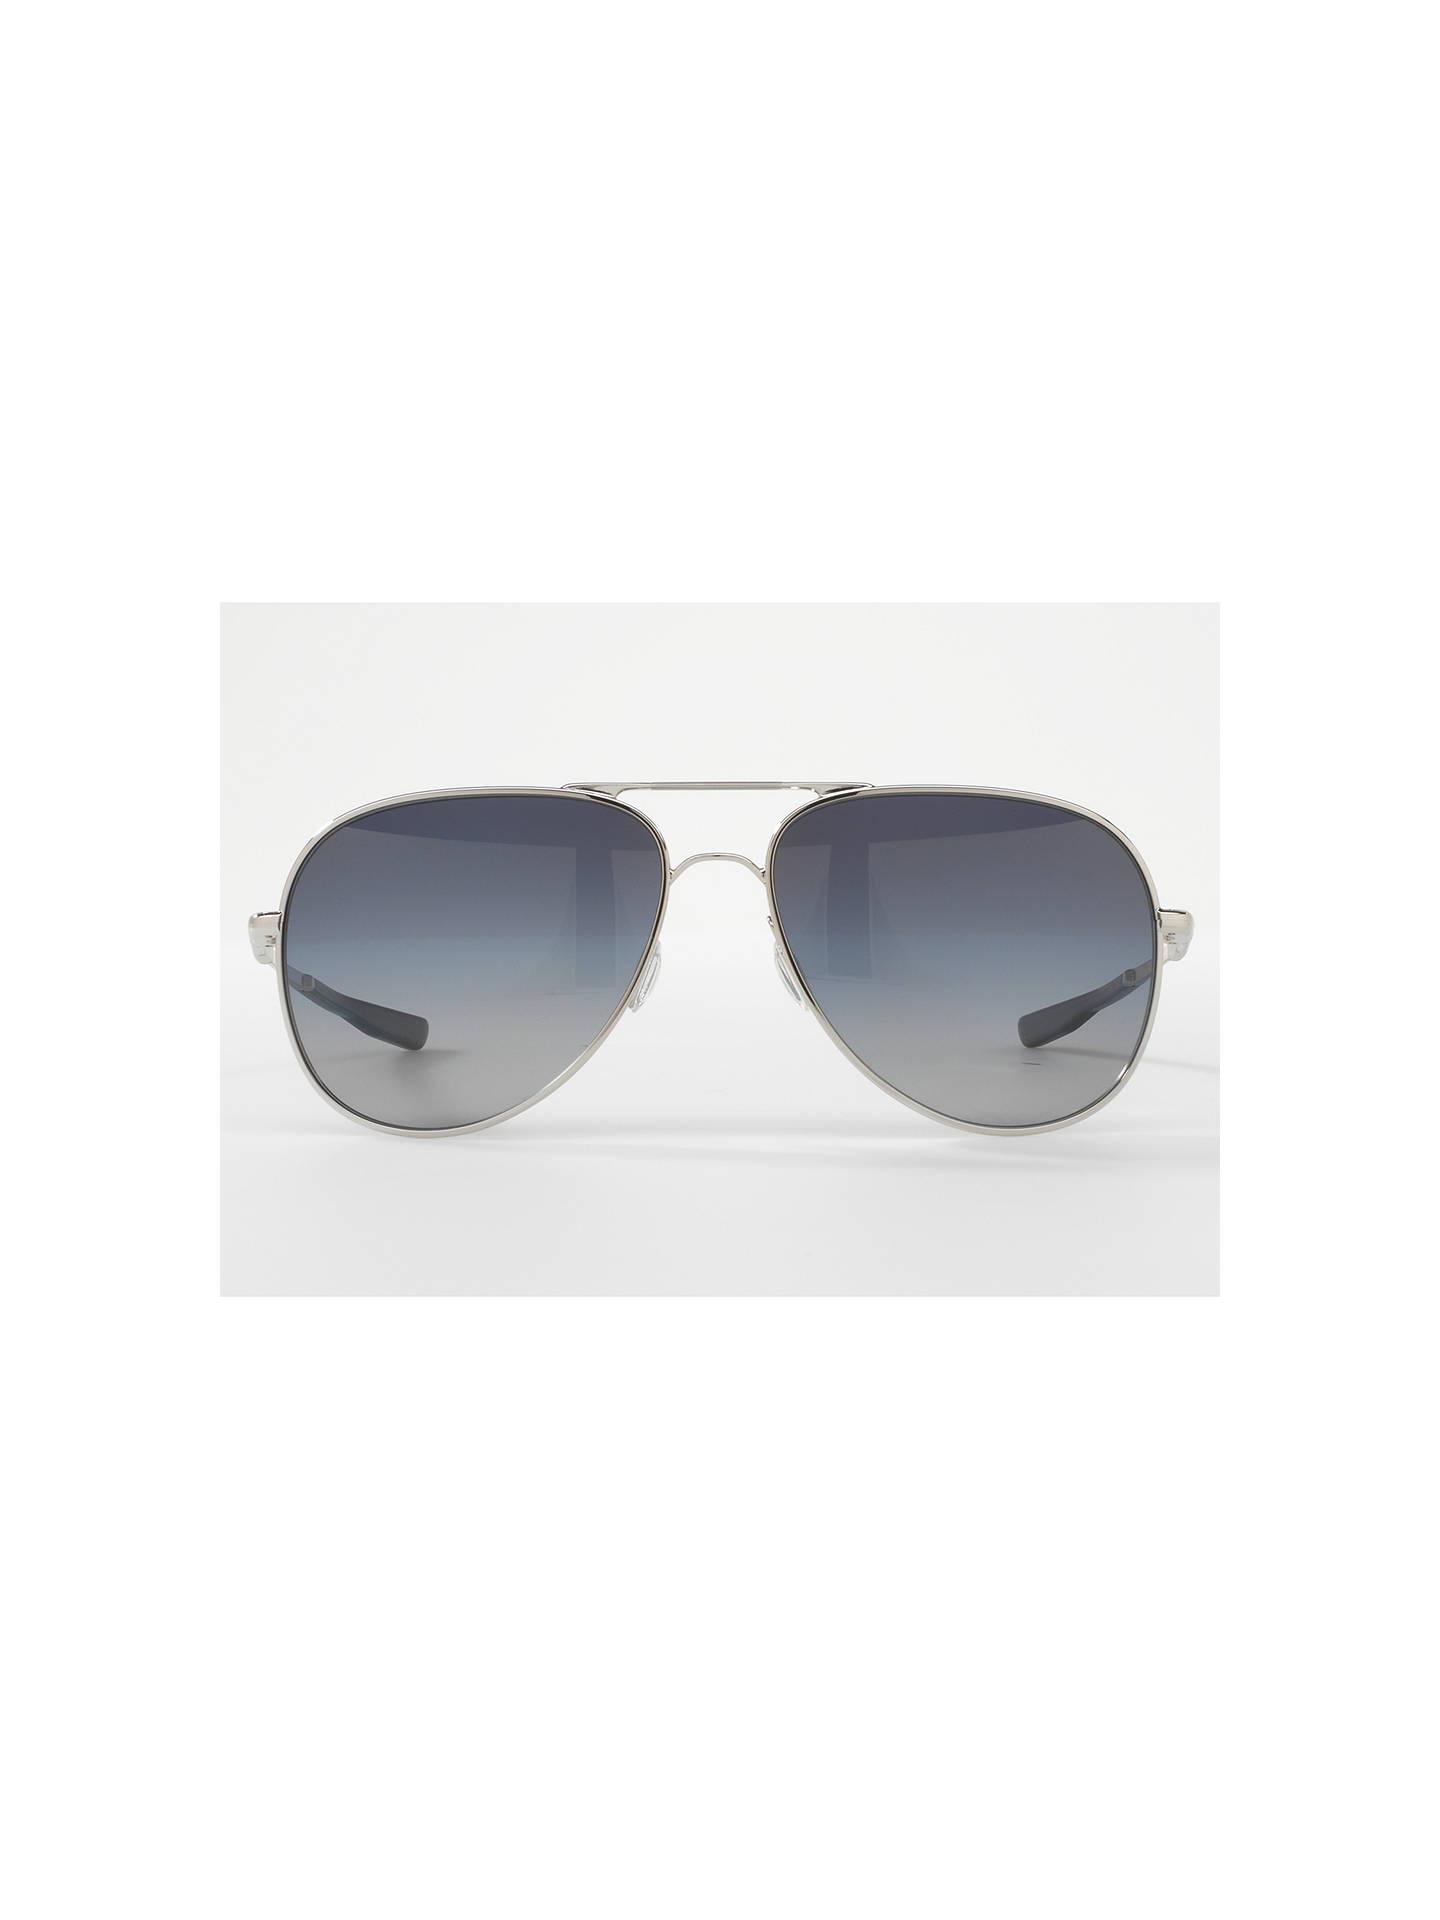 33bfa58051 ... Buy Oakley OO4119 Elmont Medium Polarised Aviator Sunglasses